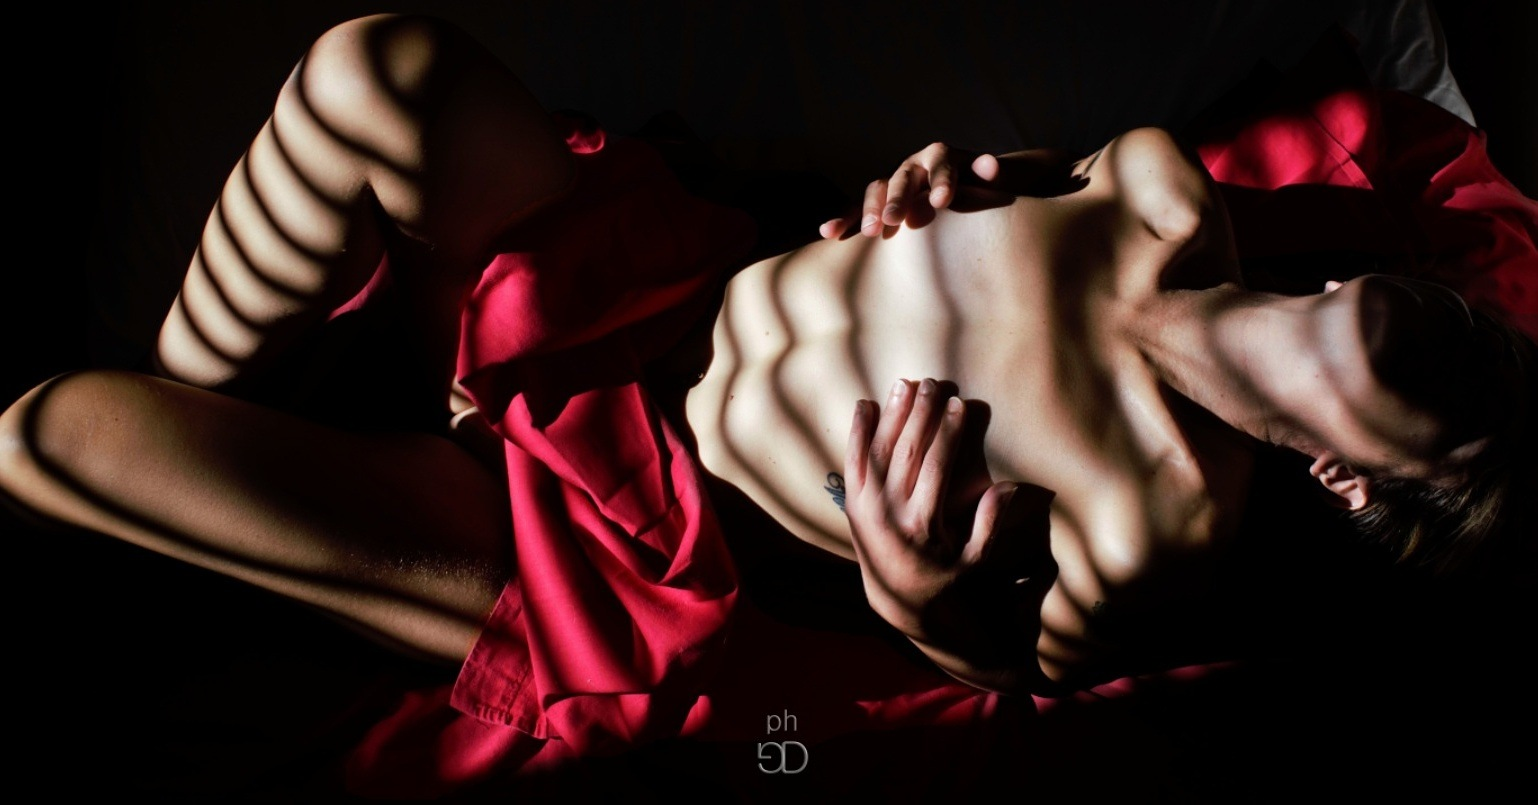 Untitled by Davide Gerardi